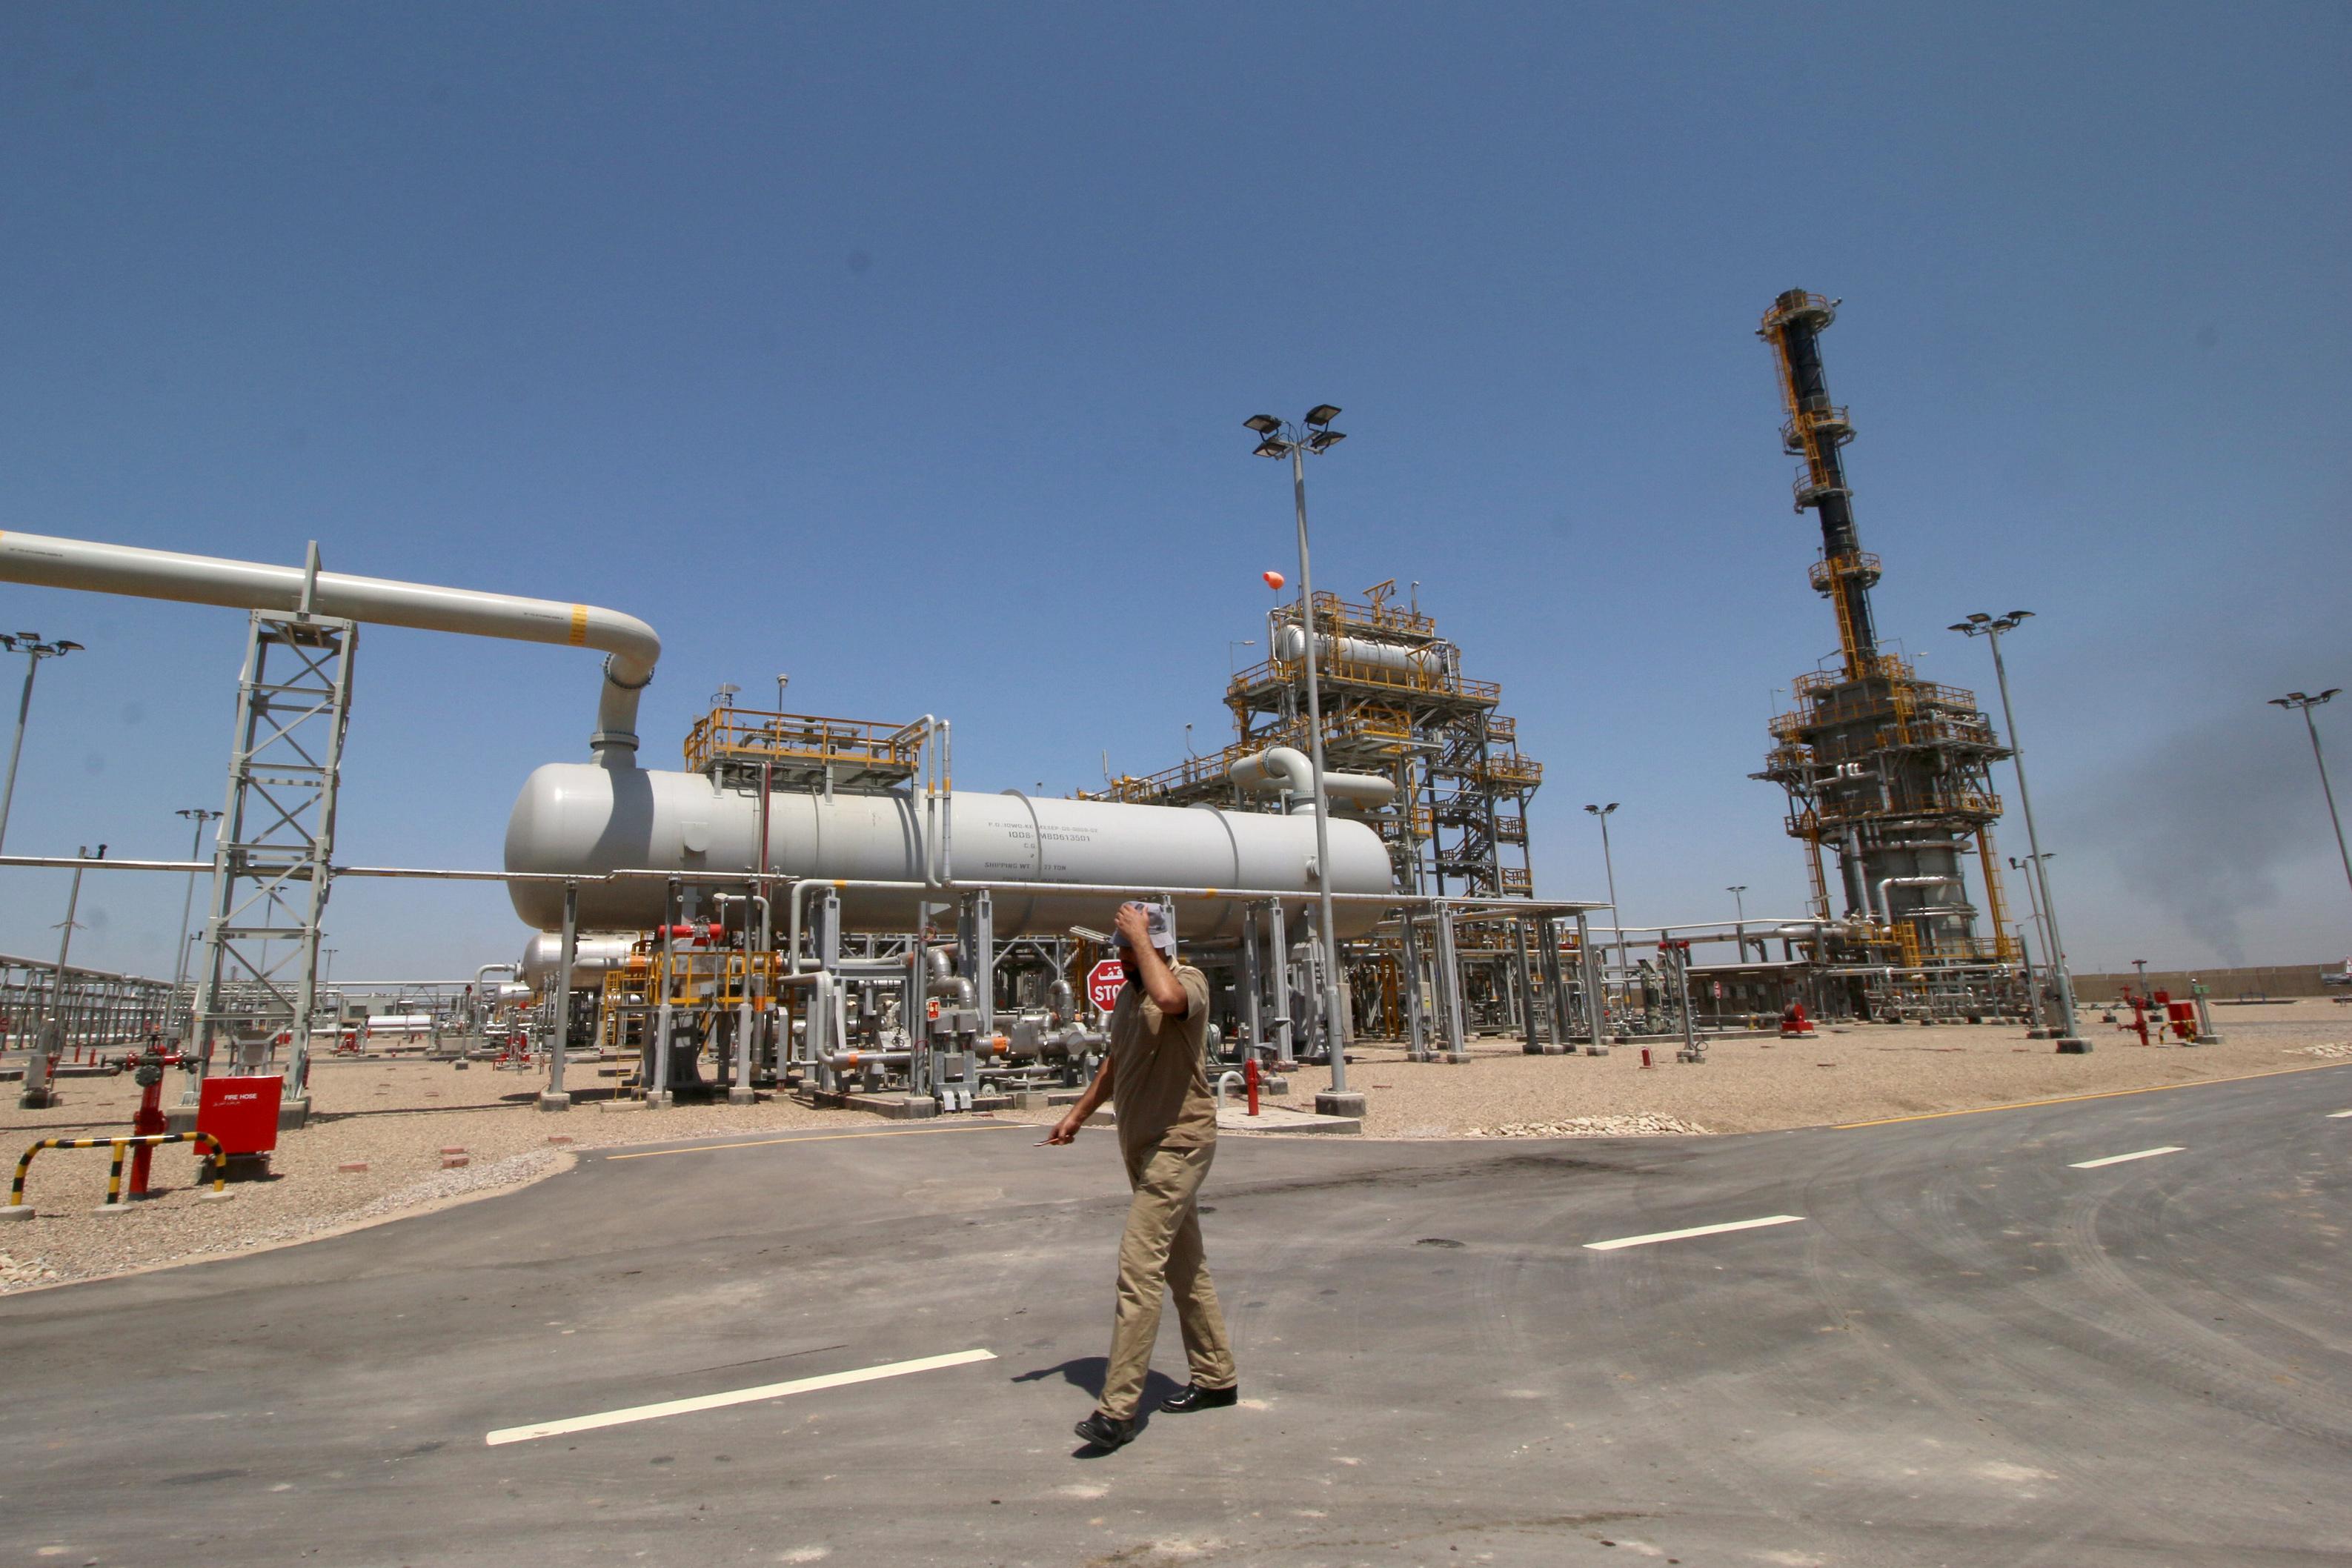 An Iraqi staff of the West Qurna-1 oilfield, which is operated by ExxonMobil, walks past the West Qurna-1 oilfield, Iraq June 17, 2019.  REUTERS/Essam Al-Sudani